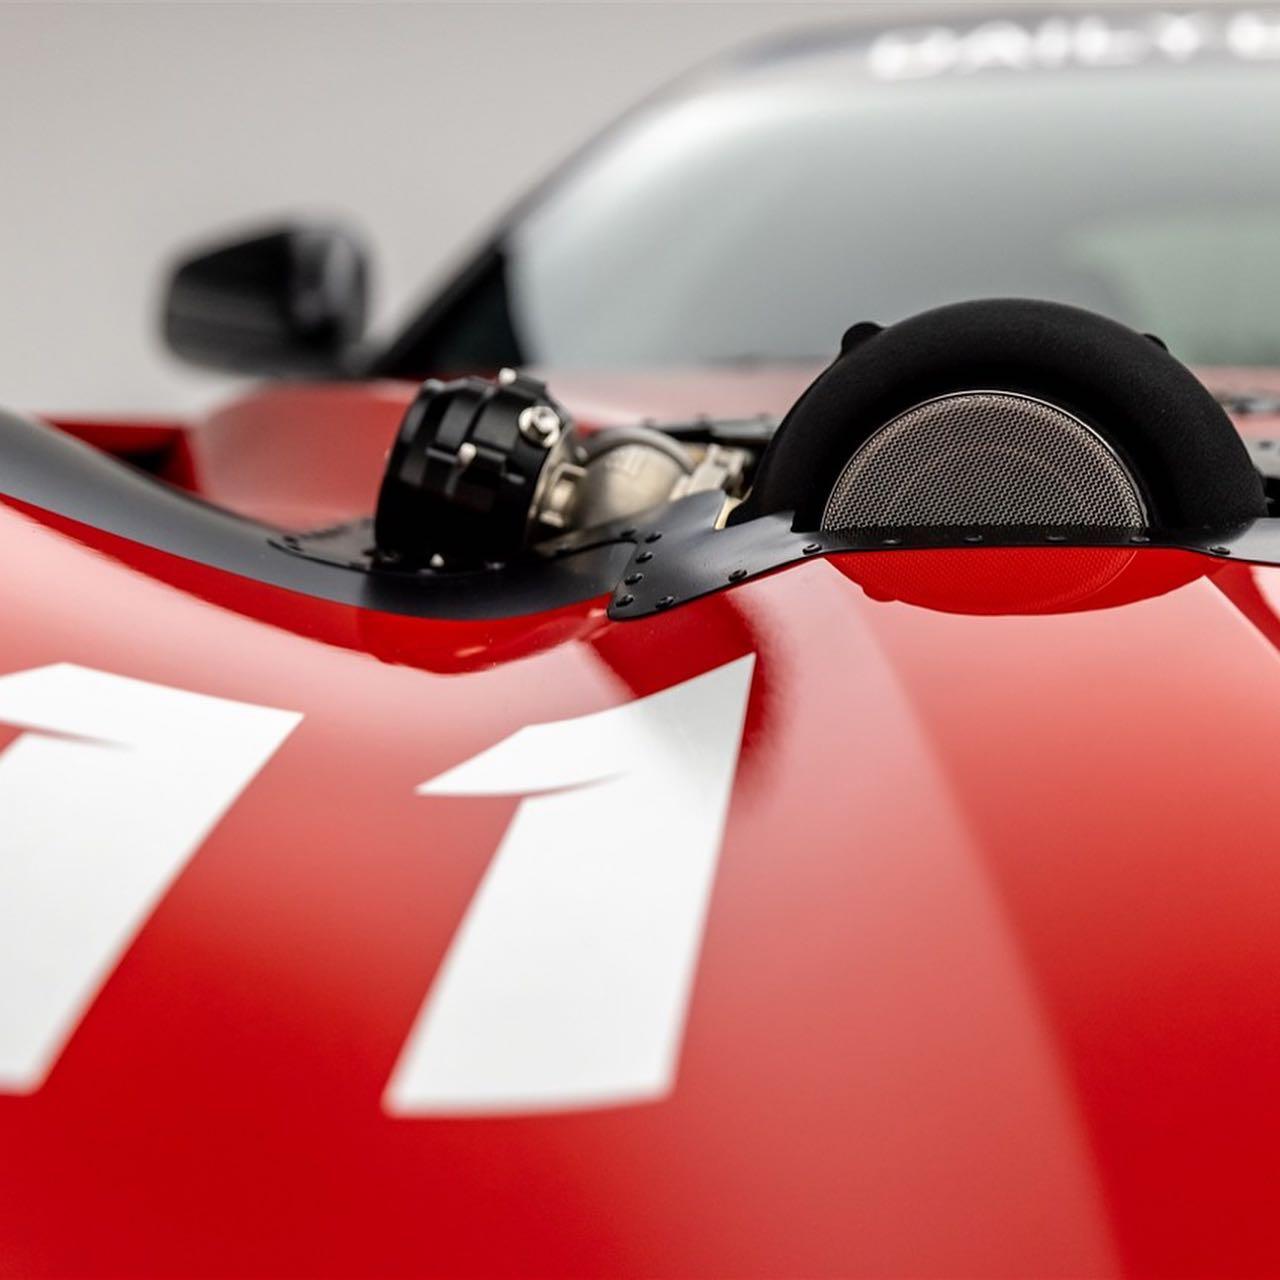 Twin-Turbo-Ferrari-F12-Berlinetta-by-Daily-Driven-Exotics-12